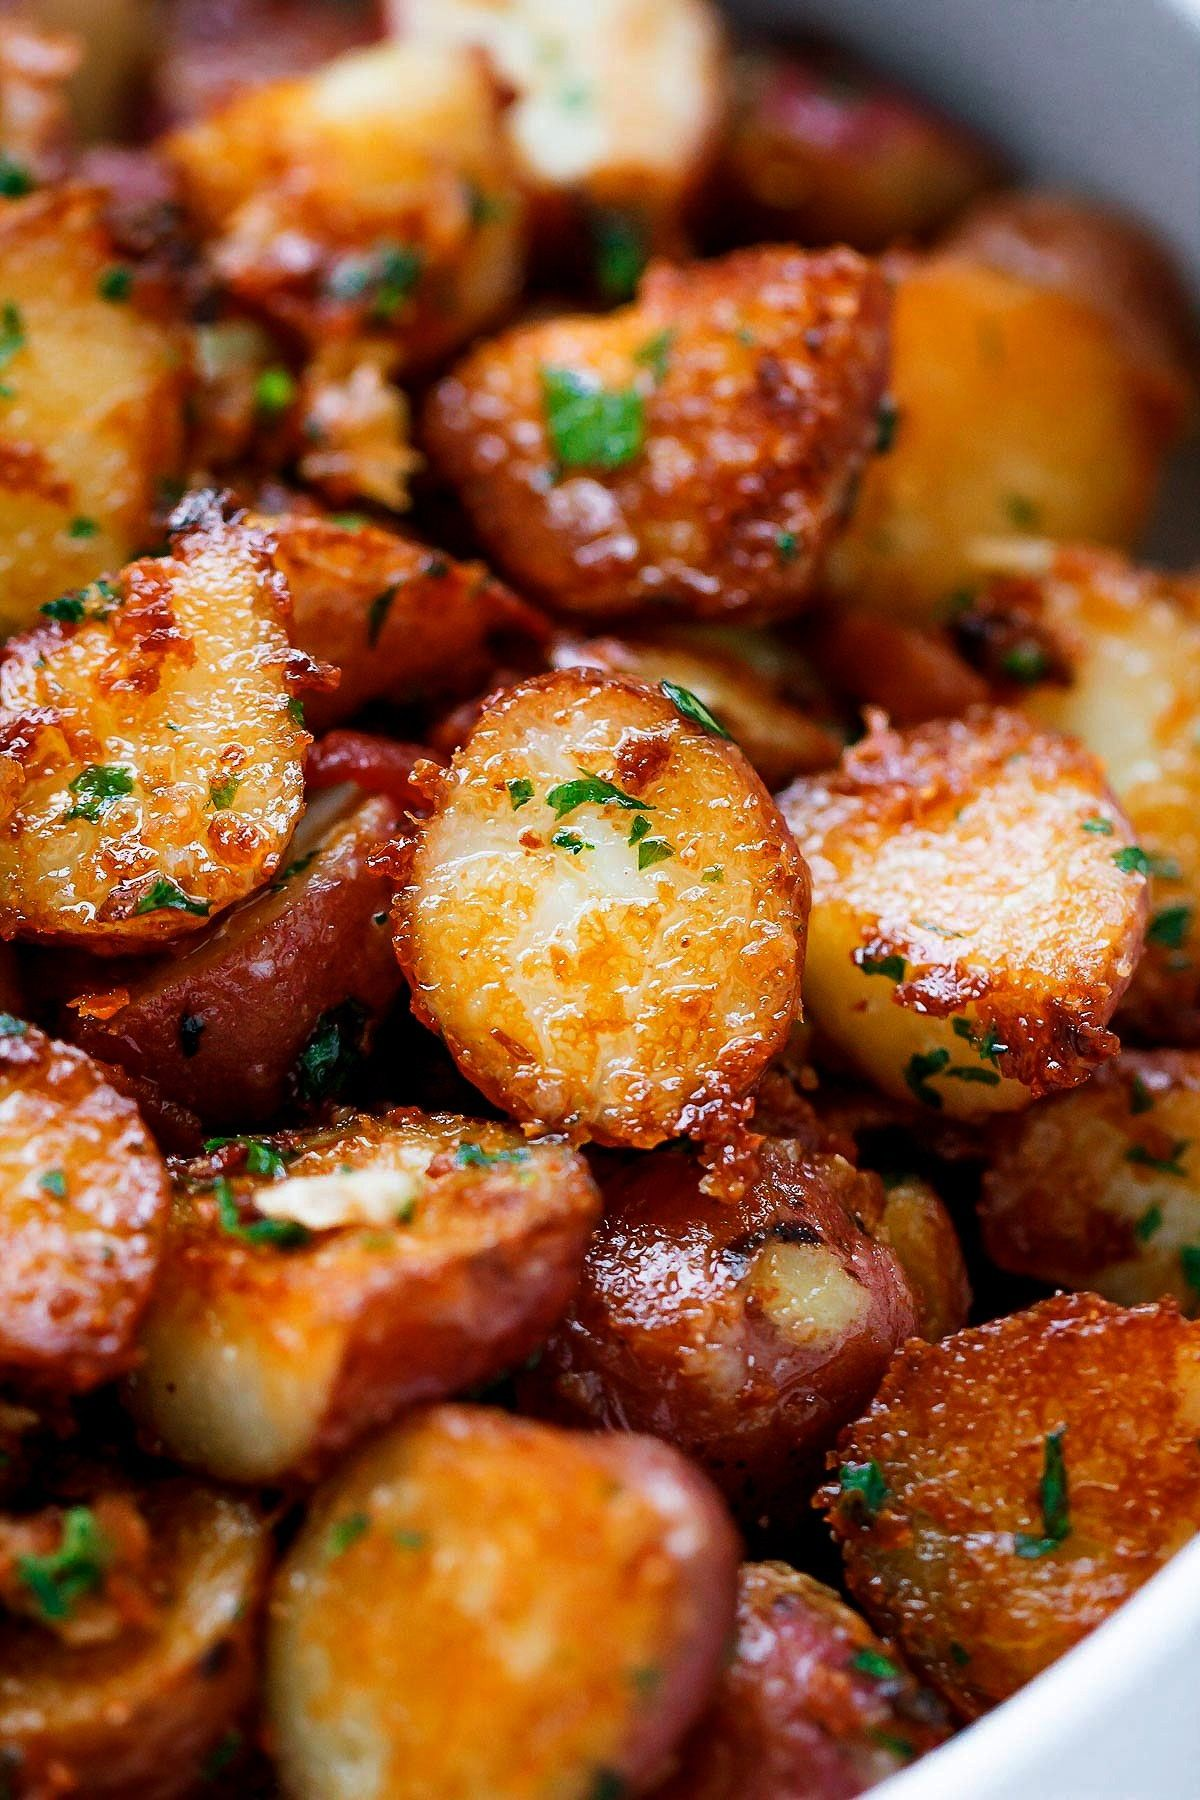 Garlic Butter Parmesan Potatoes Recipe - - These epic roasted potatoes with garlic butter parmesan